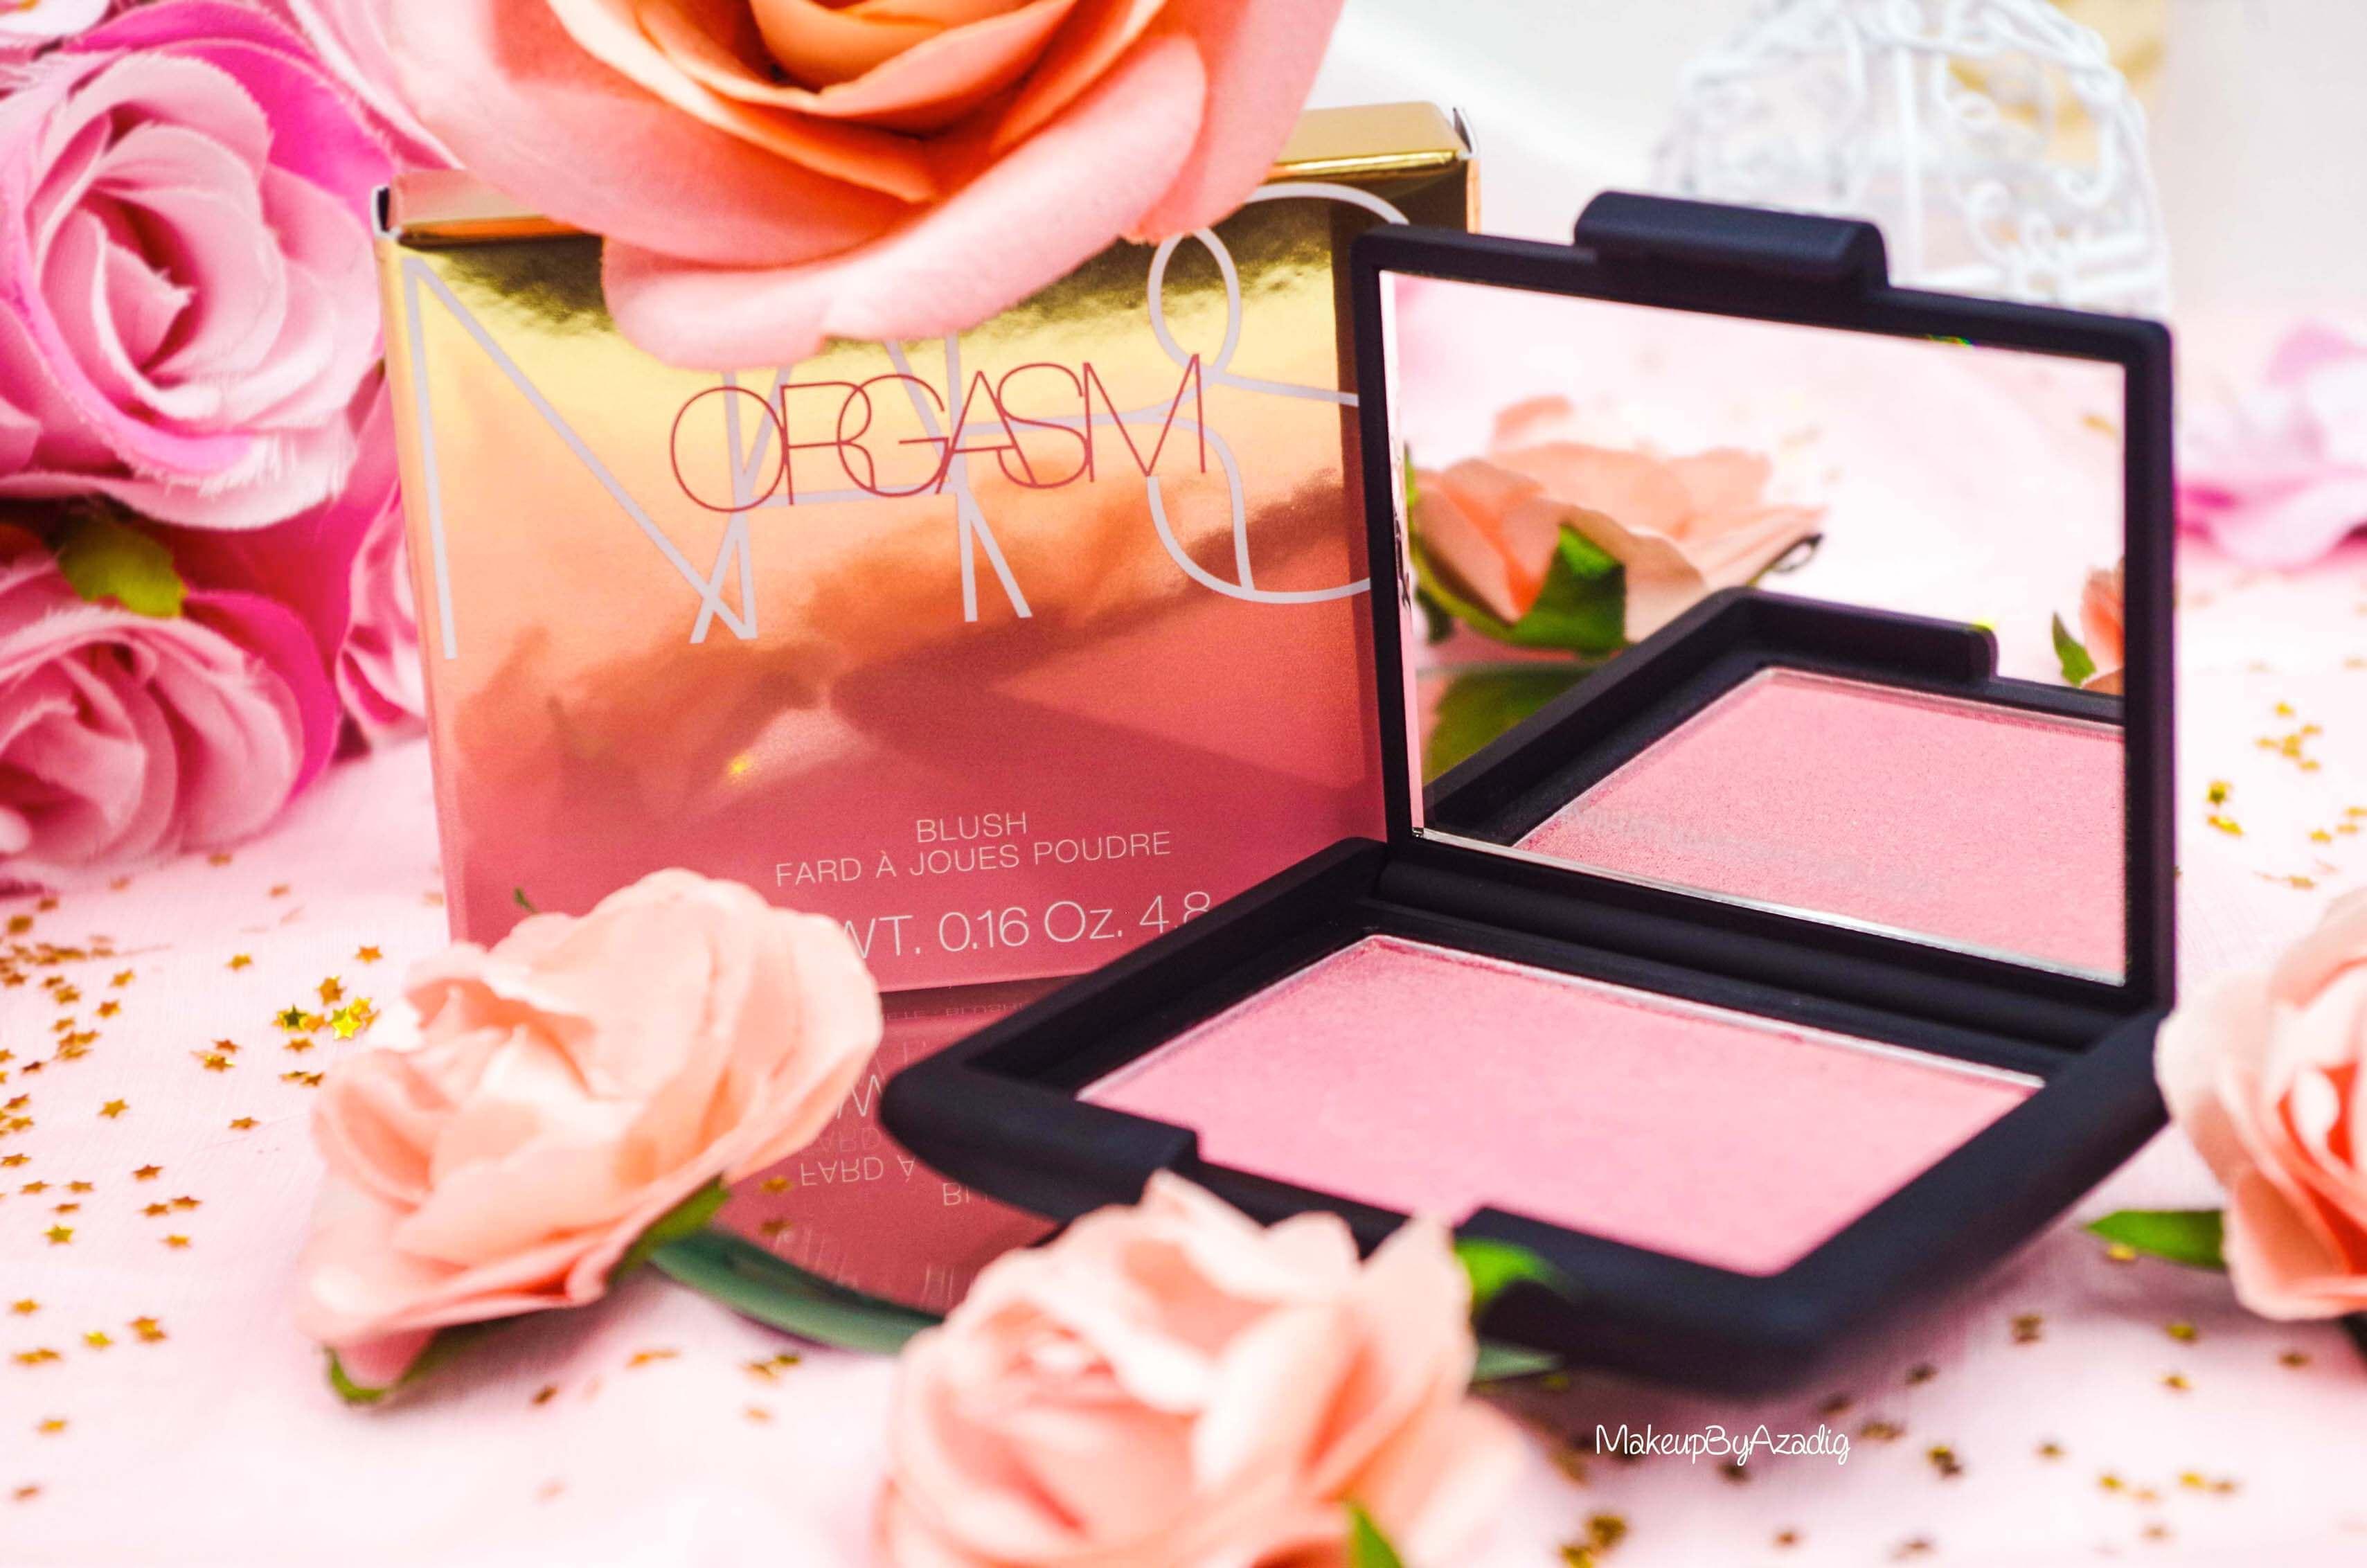 blush-liquide-orgasm-rouge-a-levres-illuminateur-highlighter-rosegold-nars-promo-makeupbyazadig